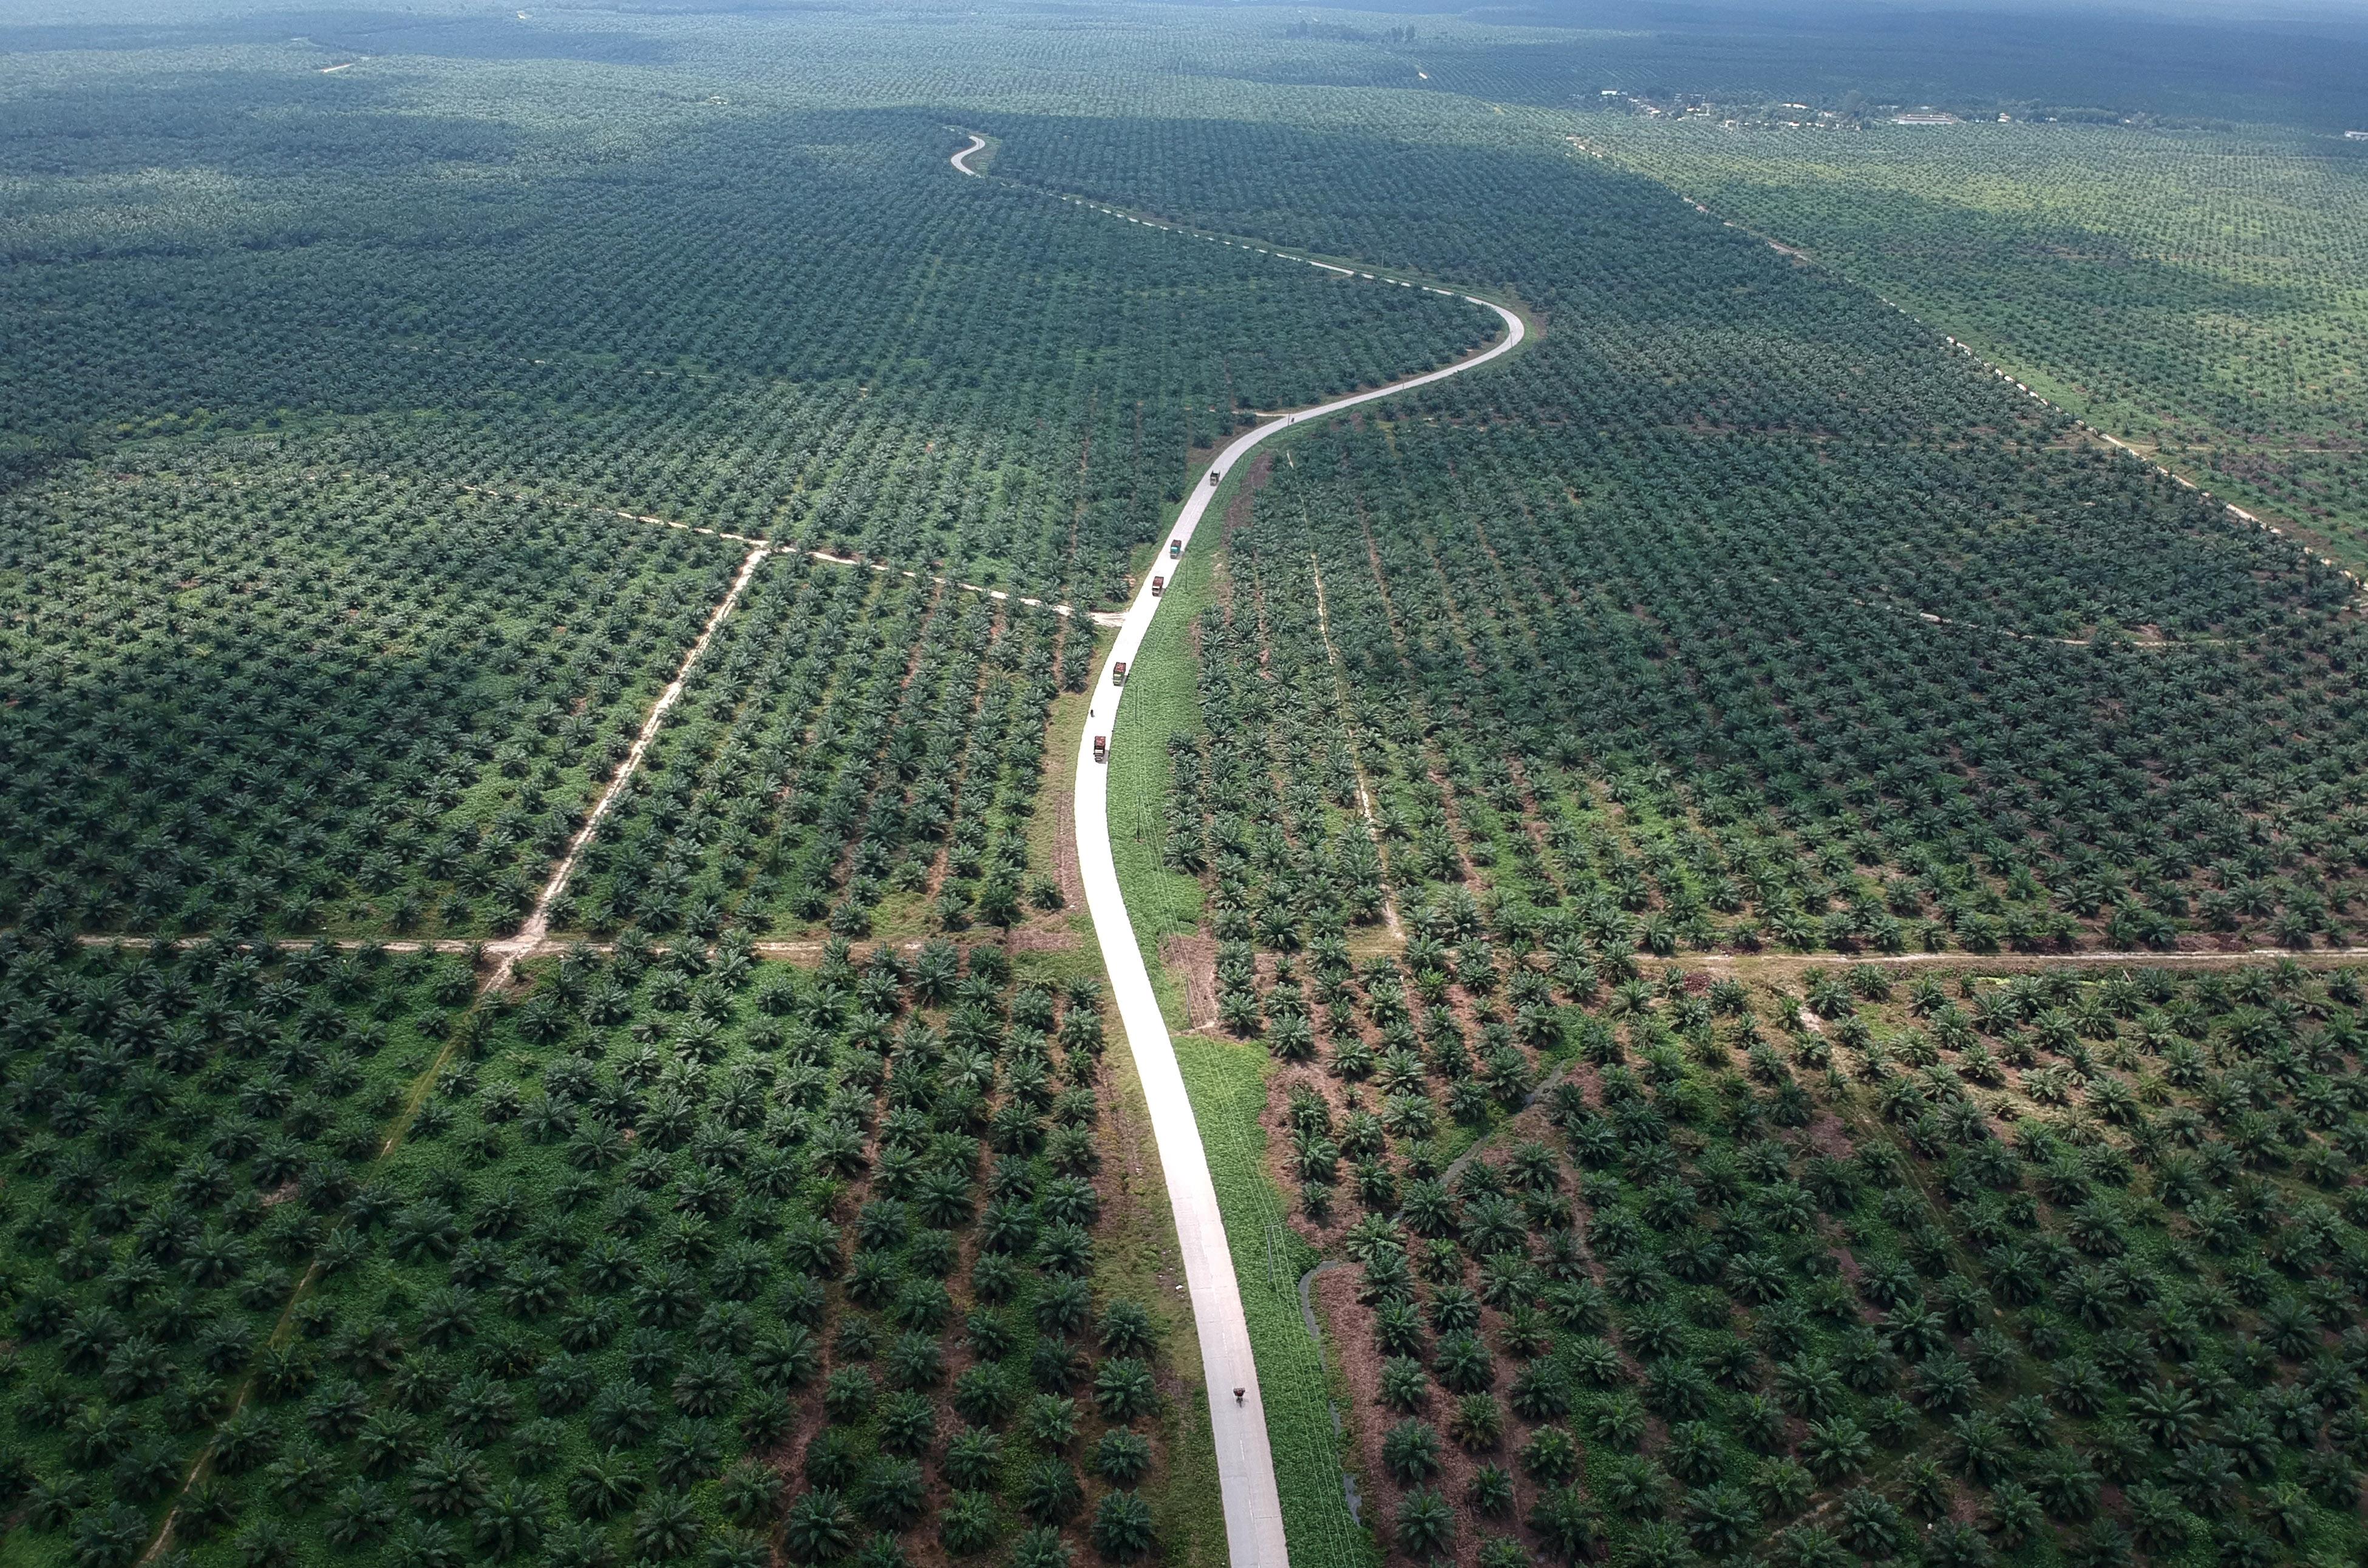 An aerial photo of a palm oil plantation in Batanghari, Jambi province, Sumatra island, Indonesia November 28, 2018. Antara Foto/Wahdi Septiawan/via REUTERS